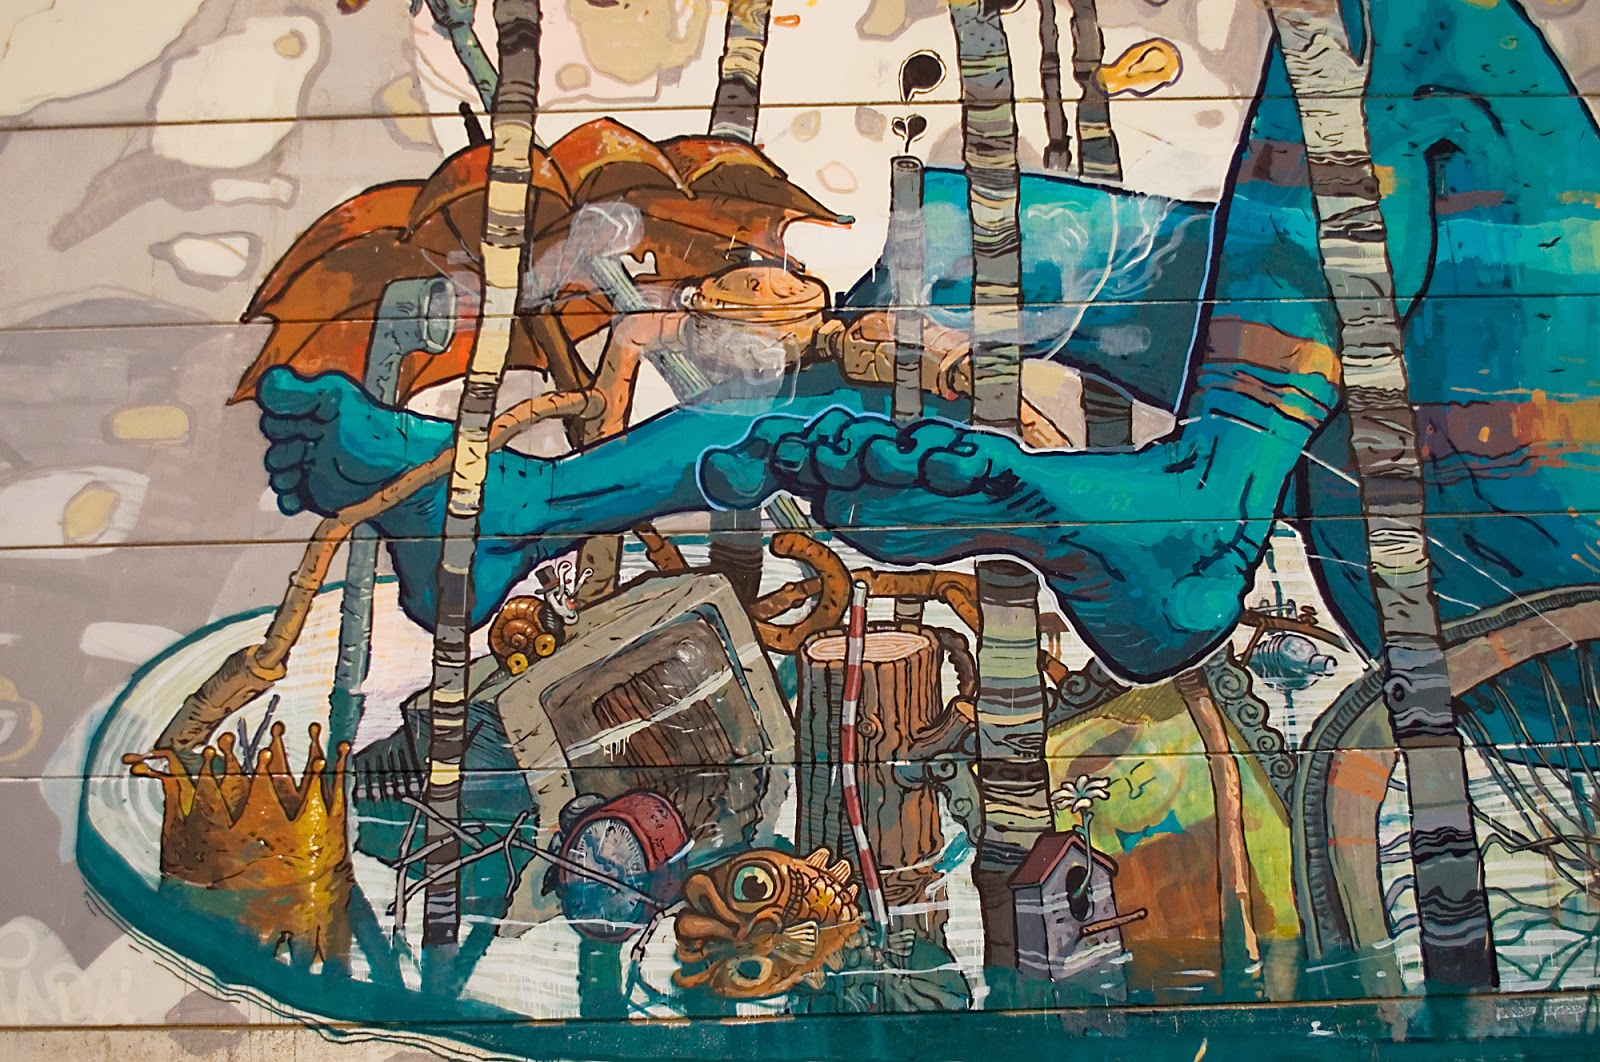 Riquiño-new-mural-at-desordes-creativas-2013-09